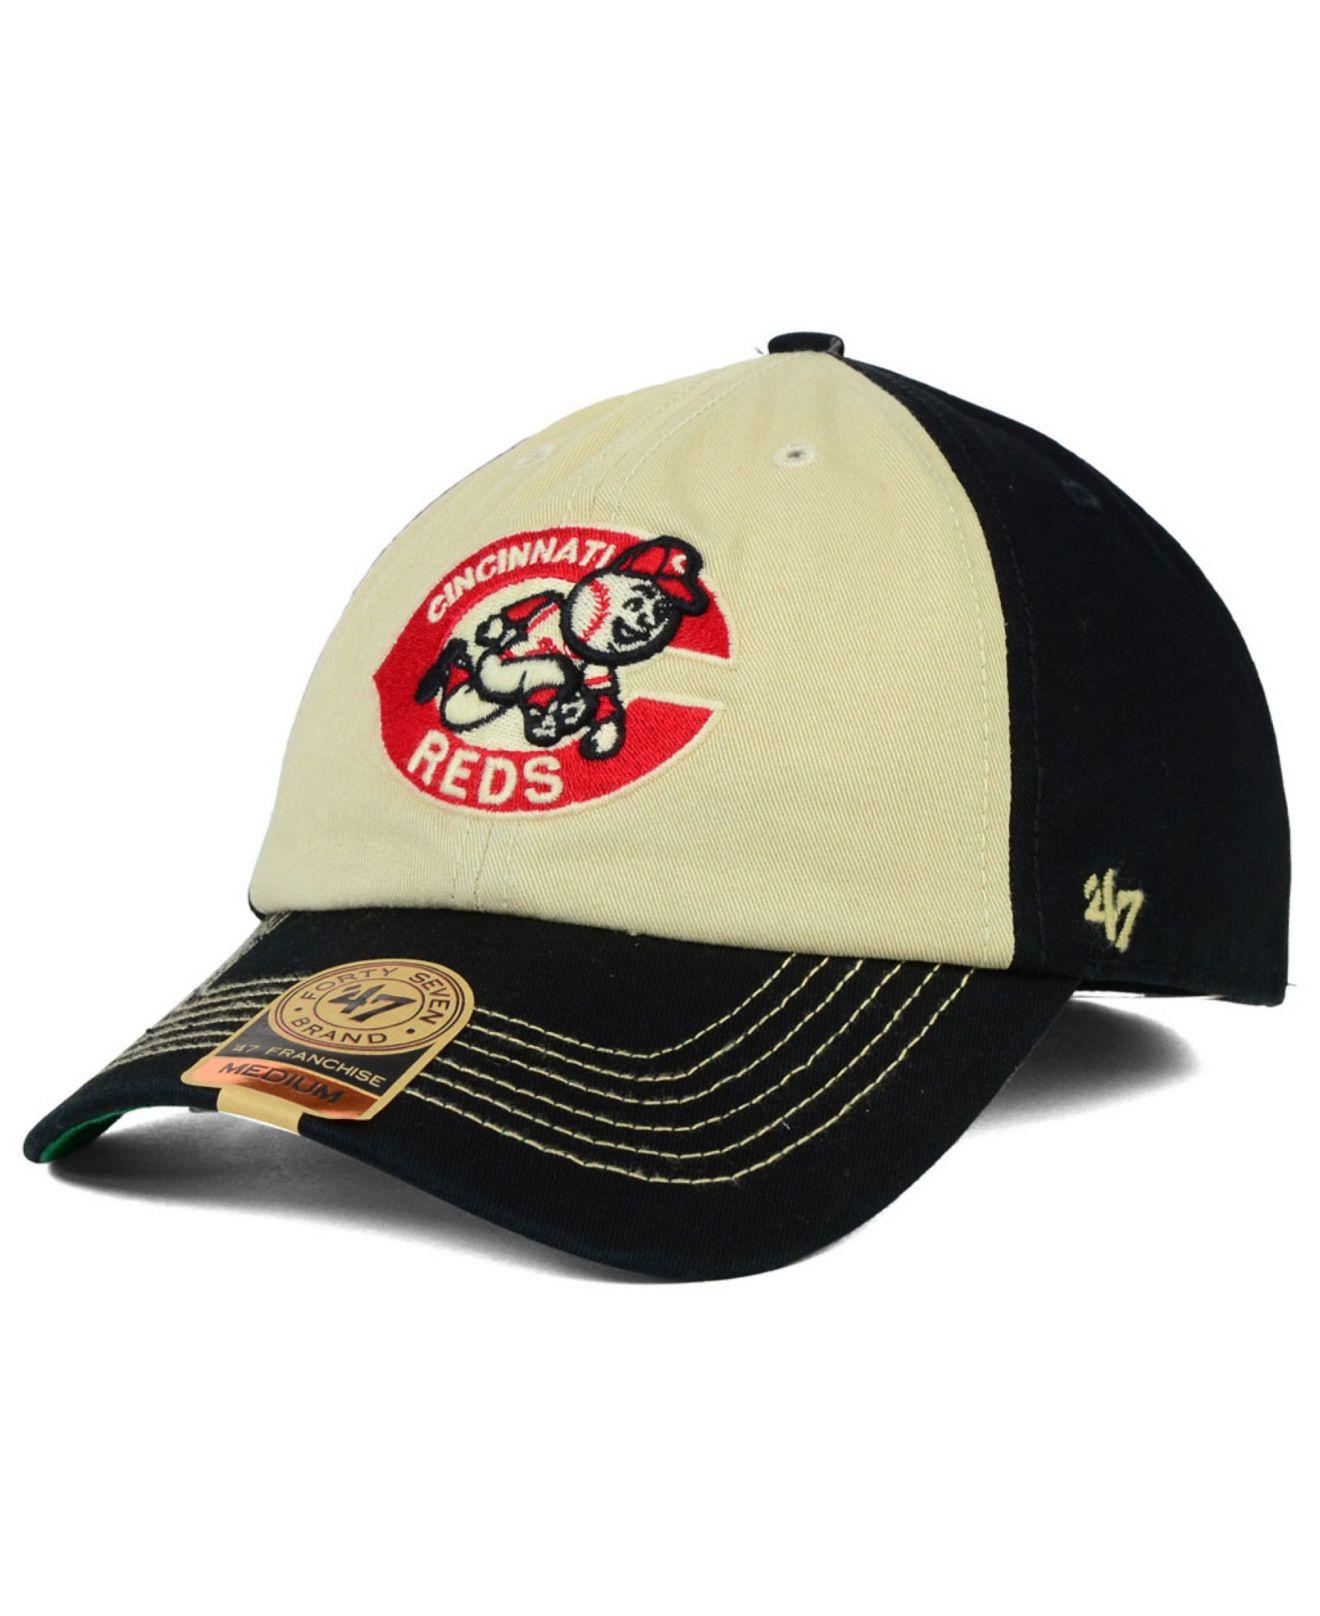 bc750c33e6146 Lyst - 47 Brand Cincinnati Reds Hodson Franchise Cap in Black for Men